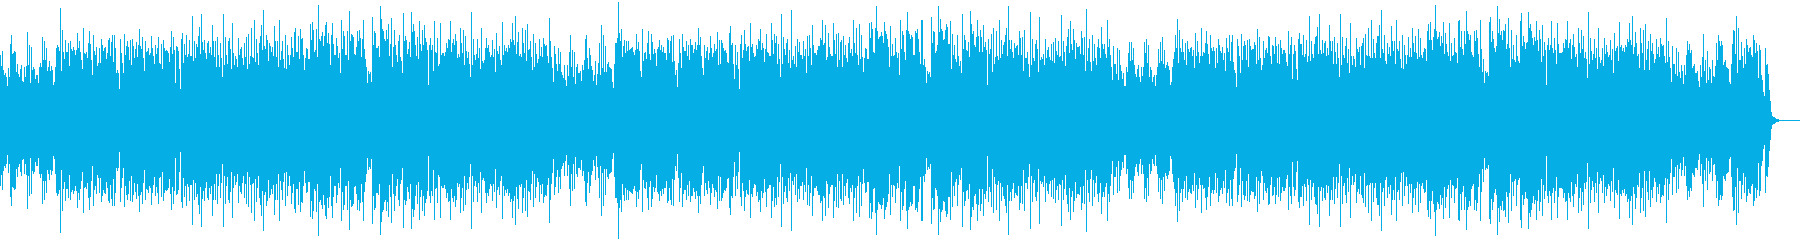 Refreshing violin / quiet / intro 9 seconds's reproduced waveform